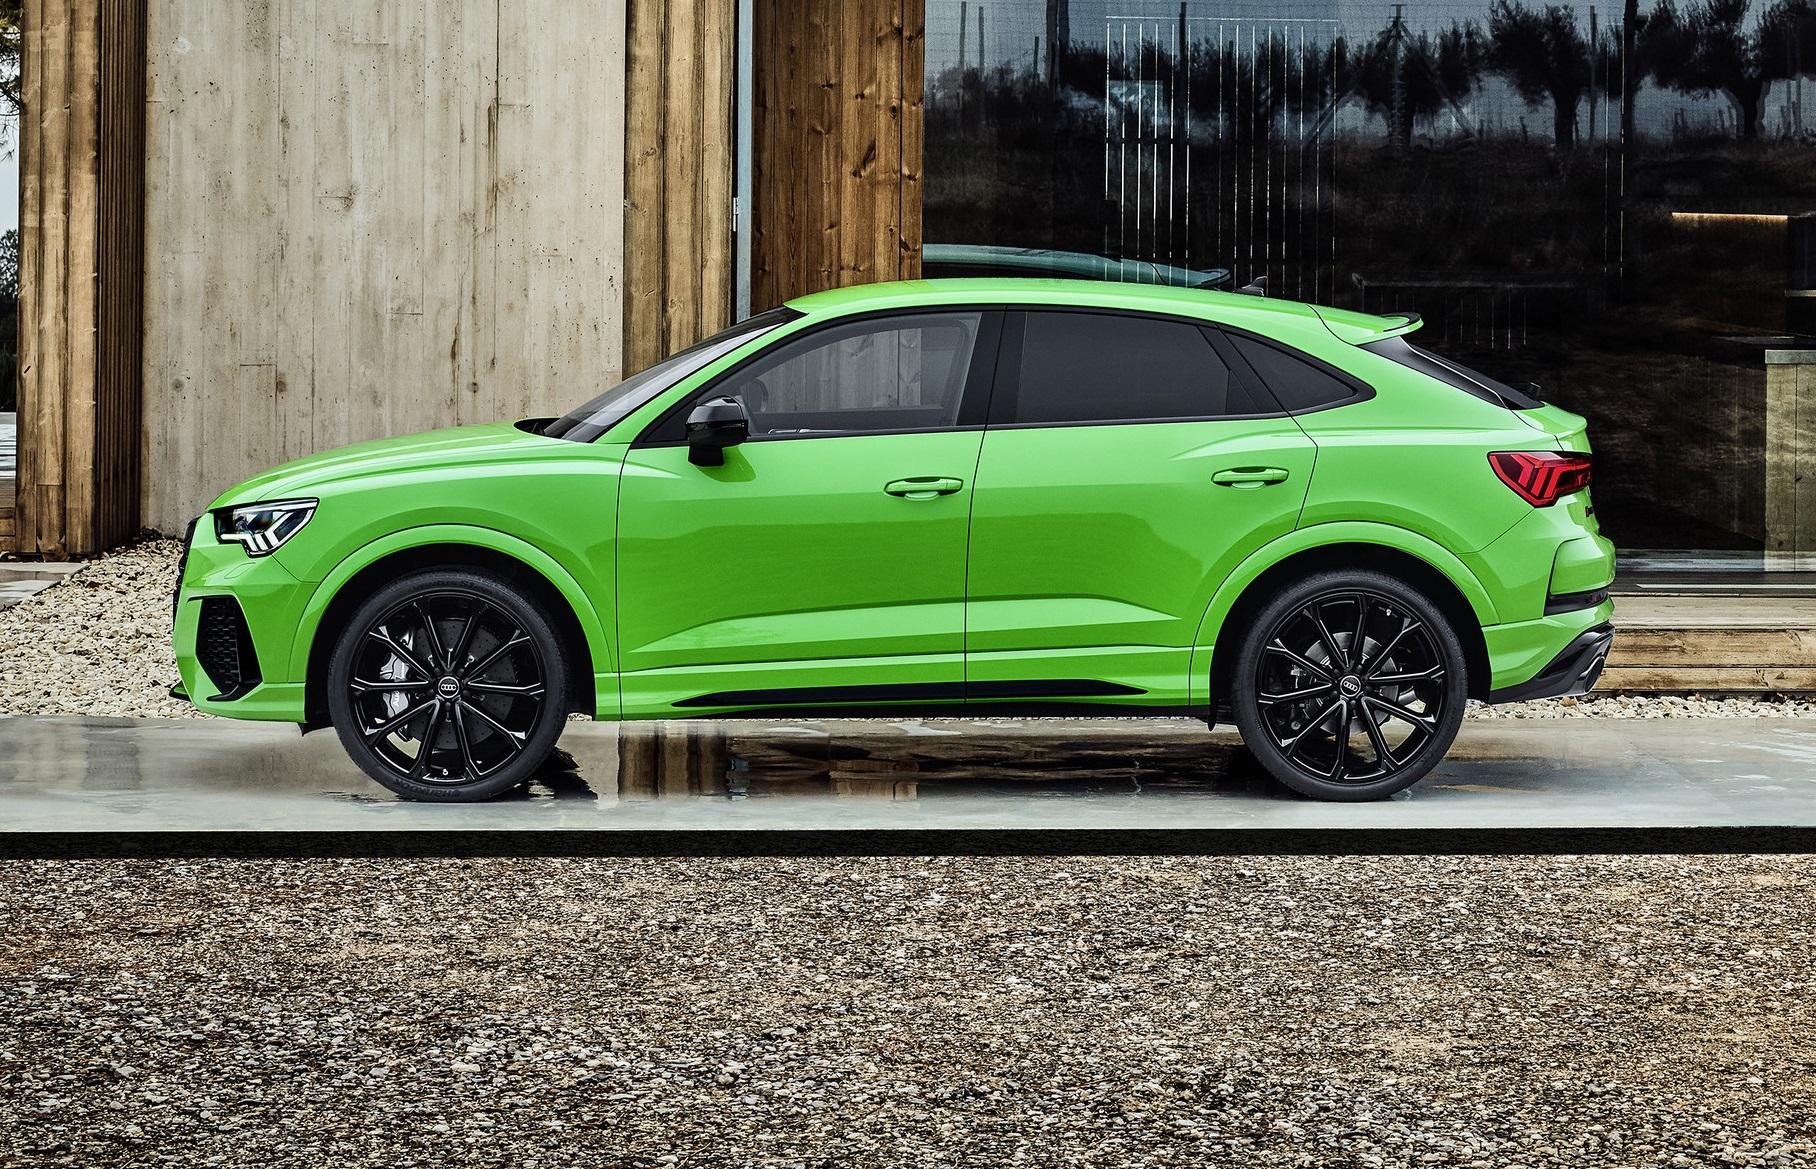 Audi RS Q3 Sportback Side View